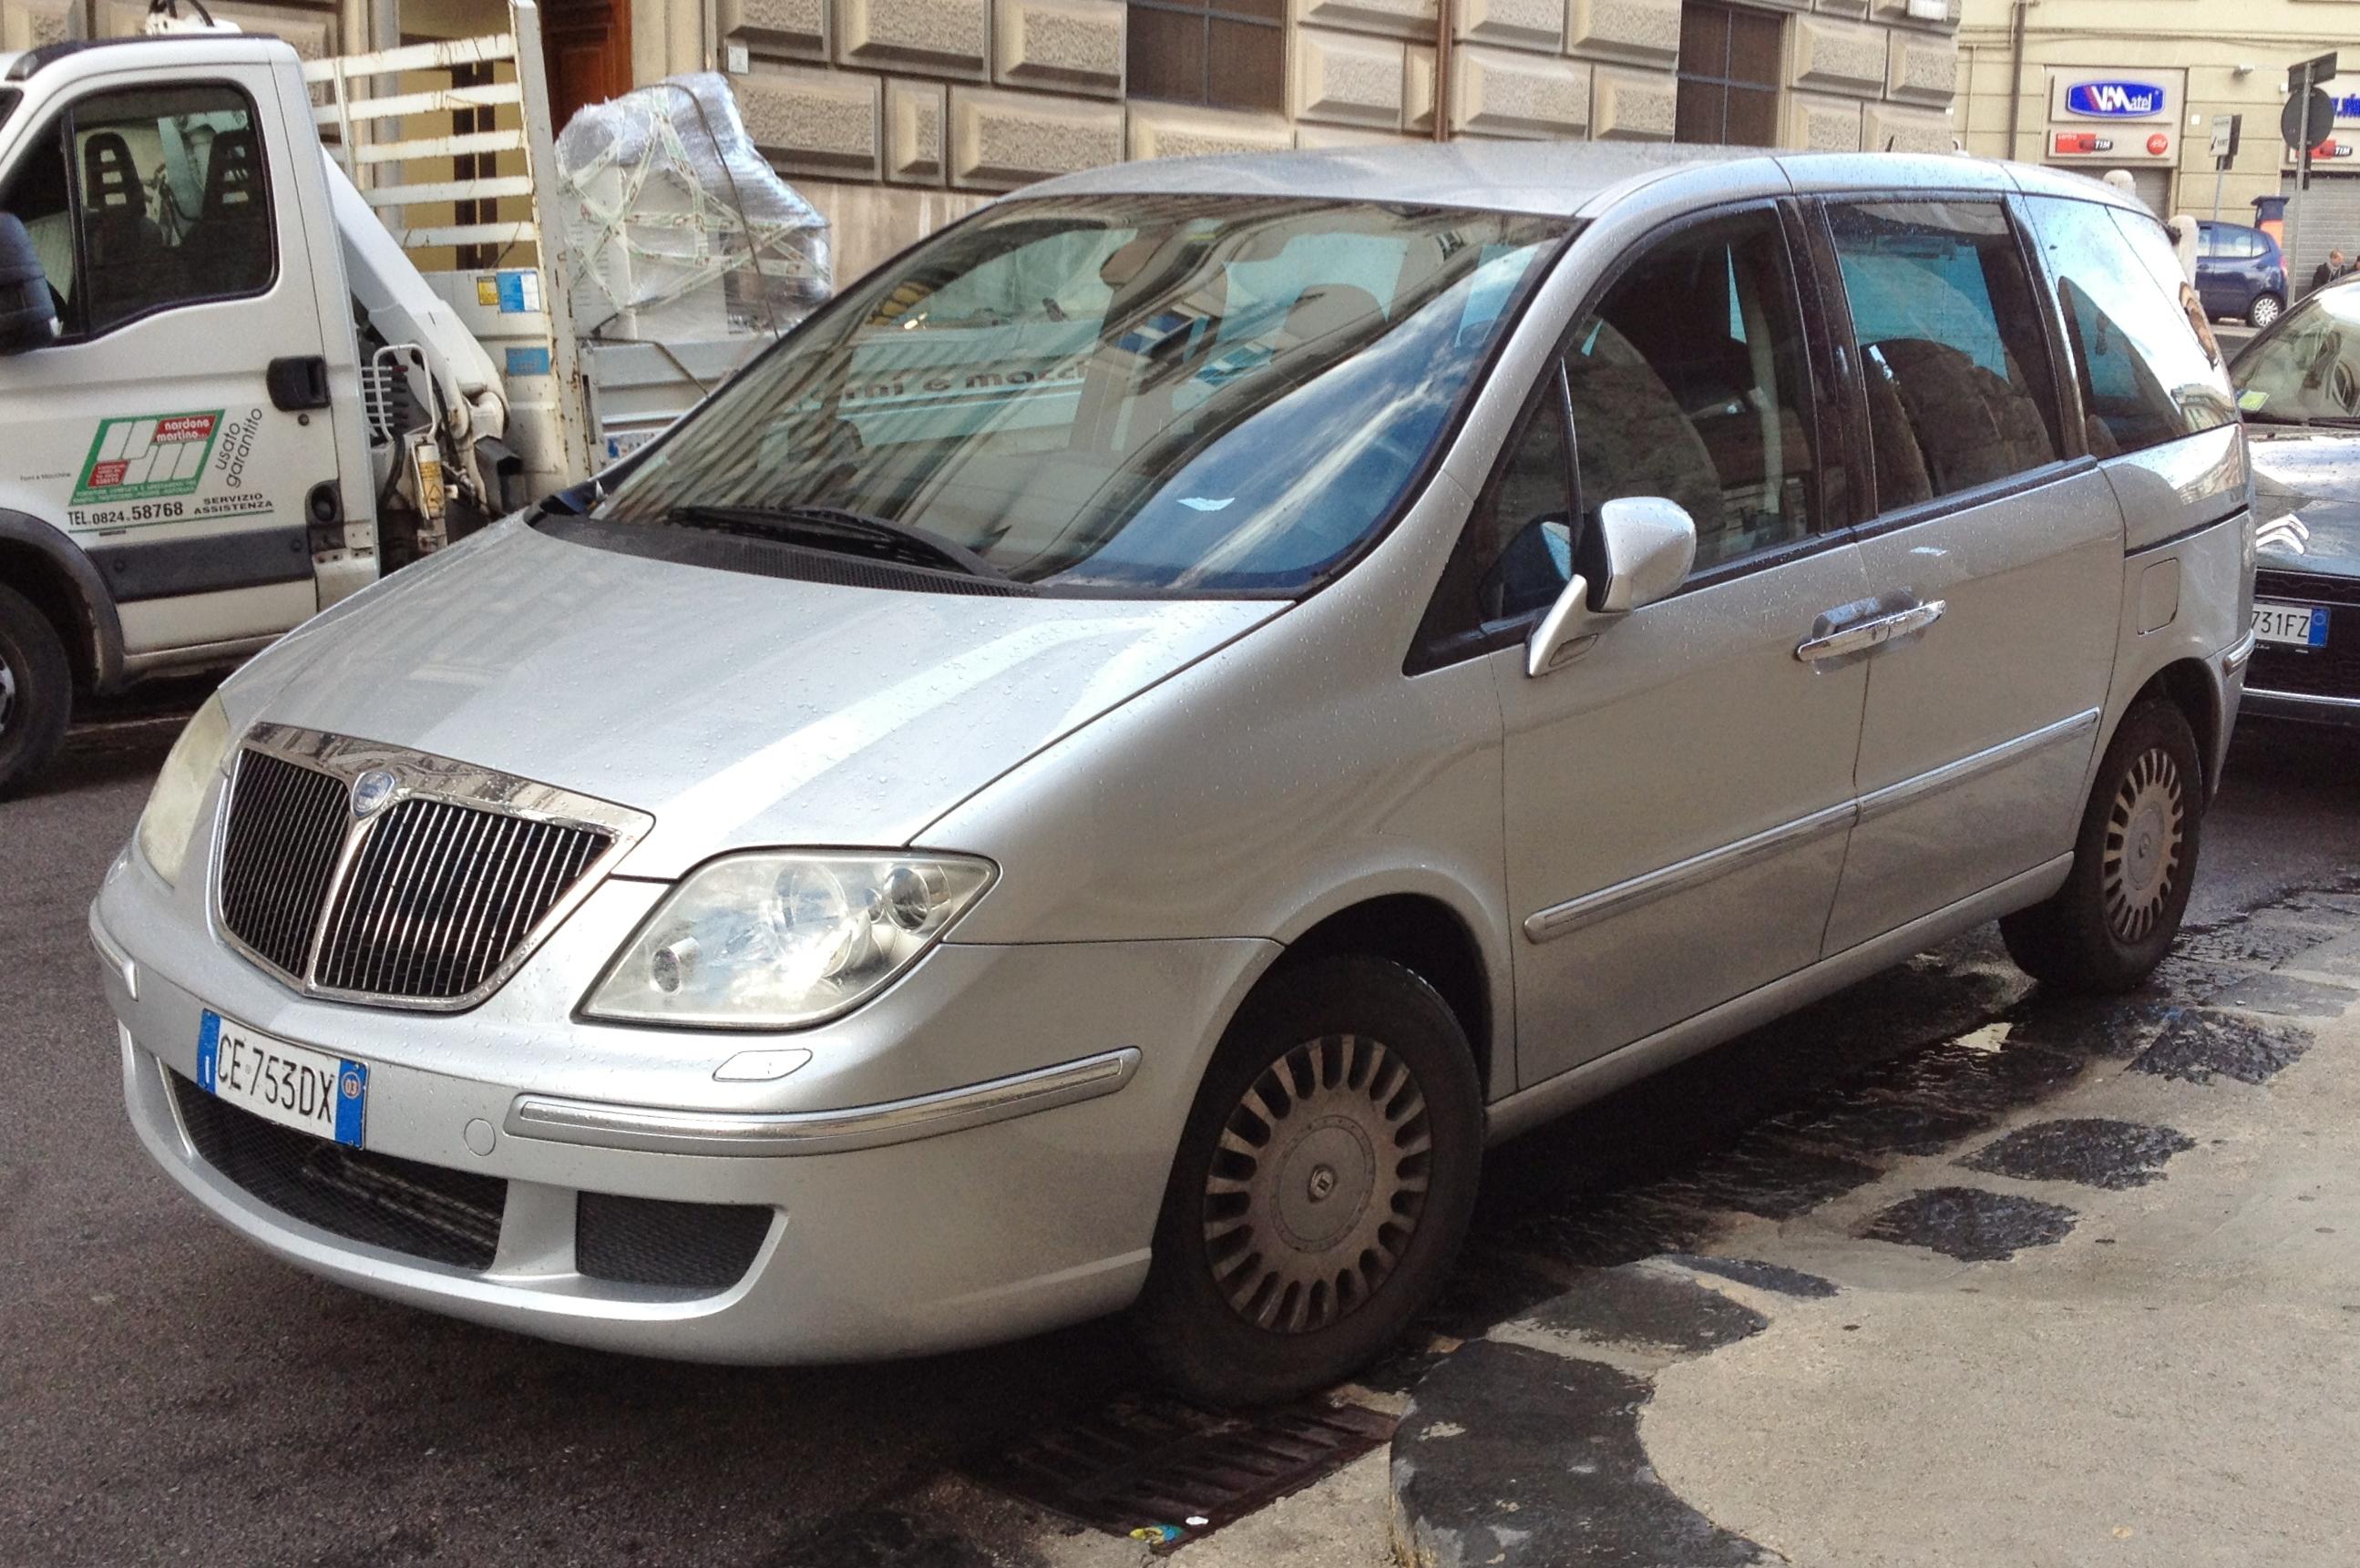 https://upload.wikimedia.org/wikipedia/commons/f/f8/Lancia_Phedra.jpg